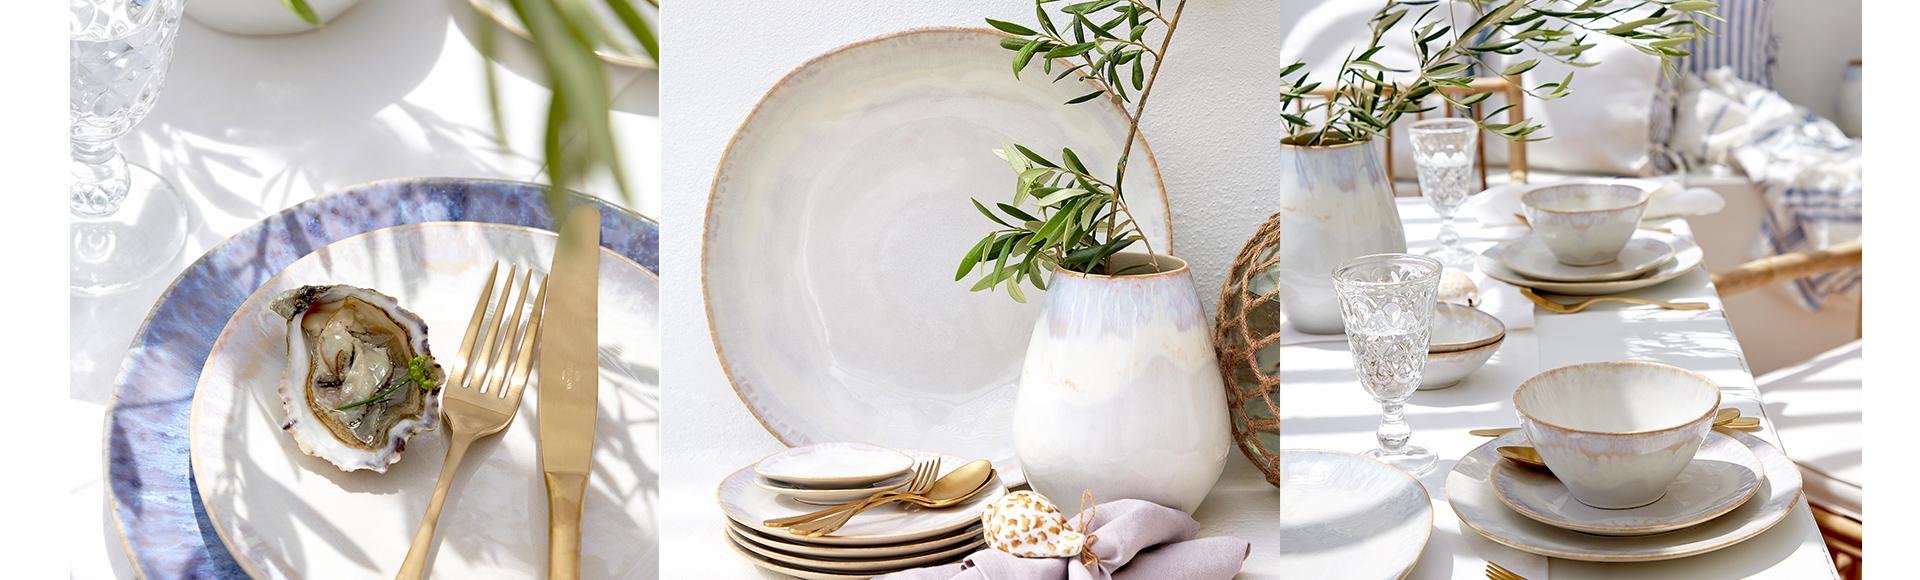 COSTA NOVA(コスタ・ノバ)ブランドのブリサシリーズ。ポルトガルのアルガルヴェ地方の風景や風にインスピレーションを受けた白と青のカラーリングが美しい食器。